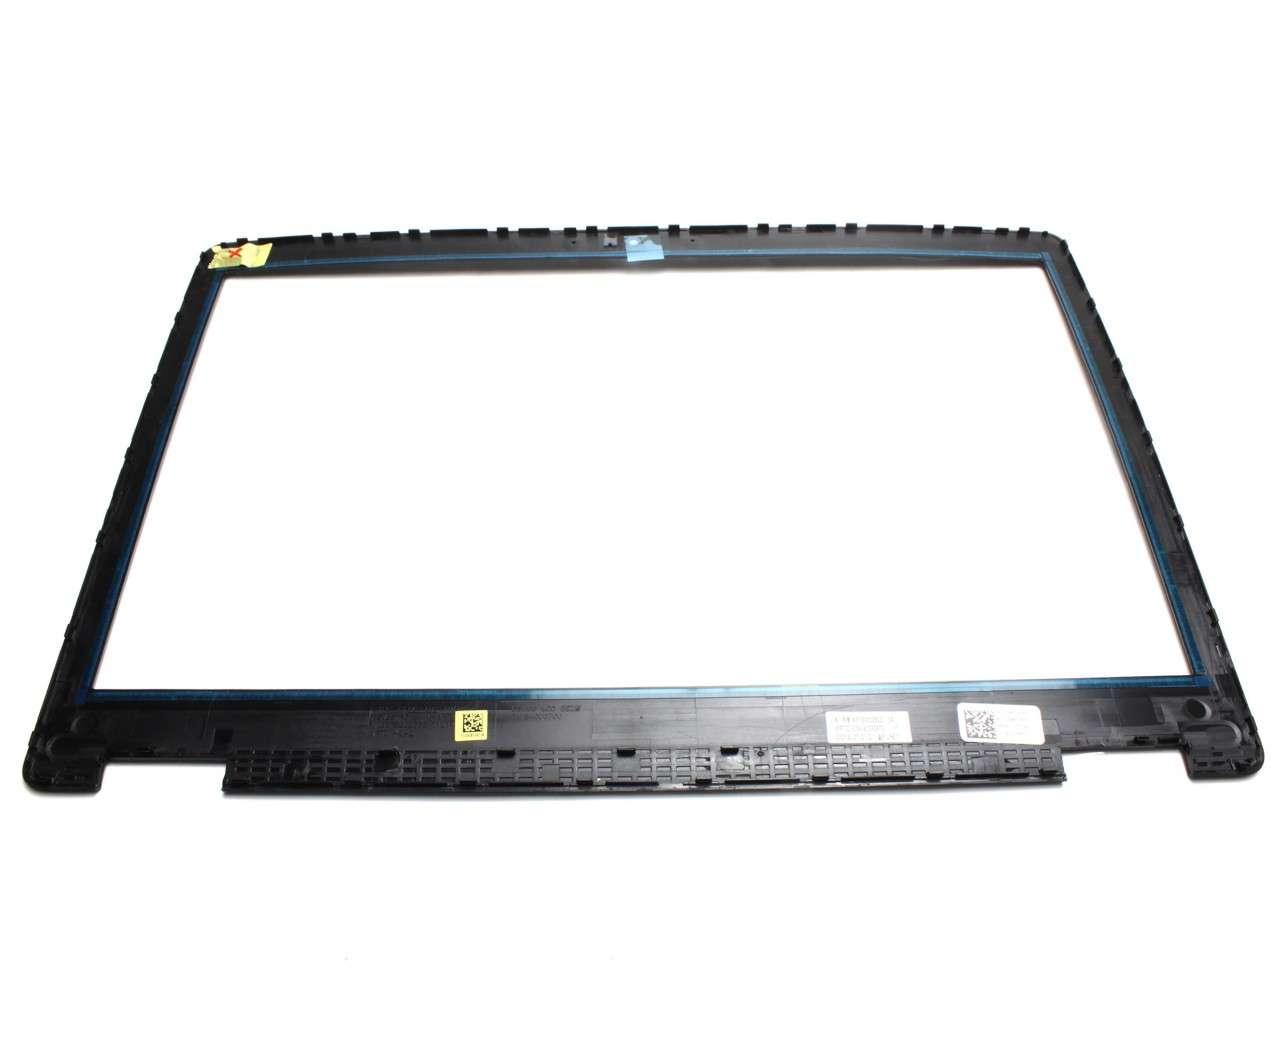 Rama Display Dell Latitude 5580 Bezel Front Cover Neagra imagine powerlaptop.ro 2021